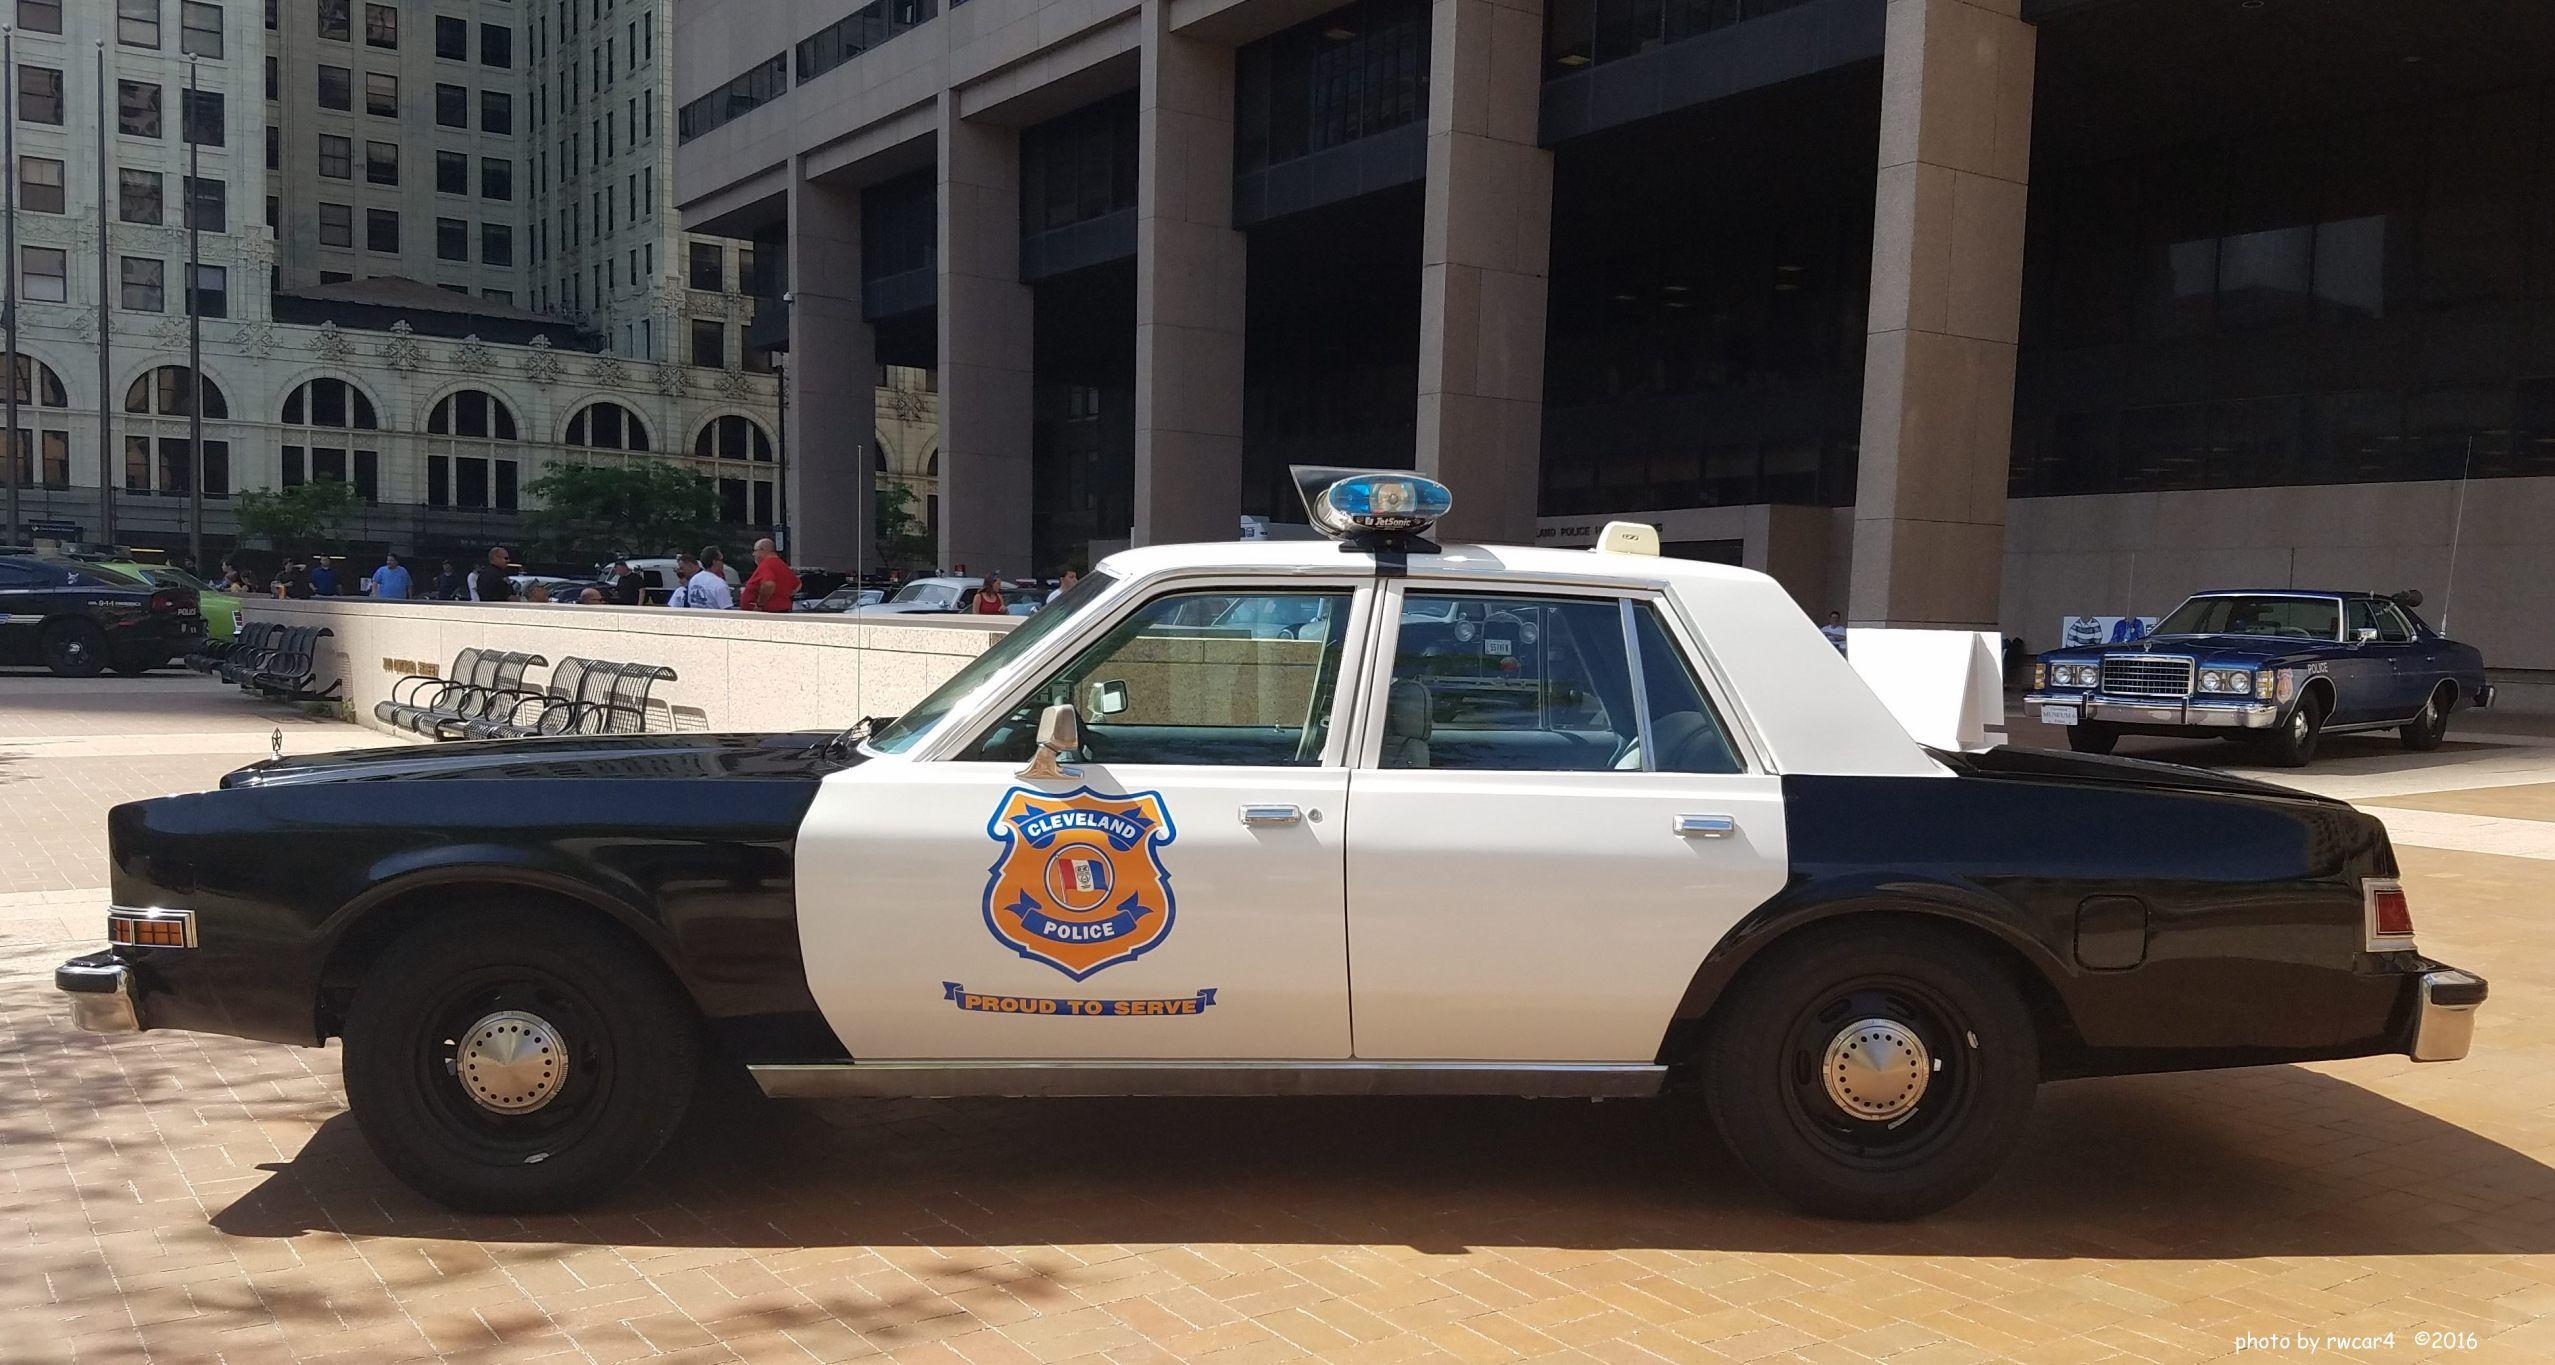 Cleveland Police 1988 Dodge Diplomat Police Cars Cleveland Police Police